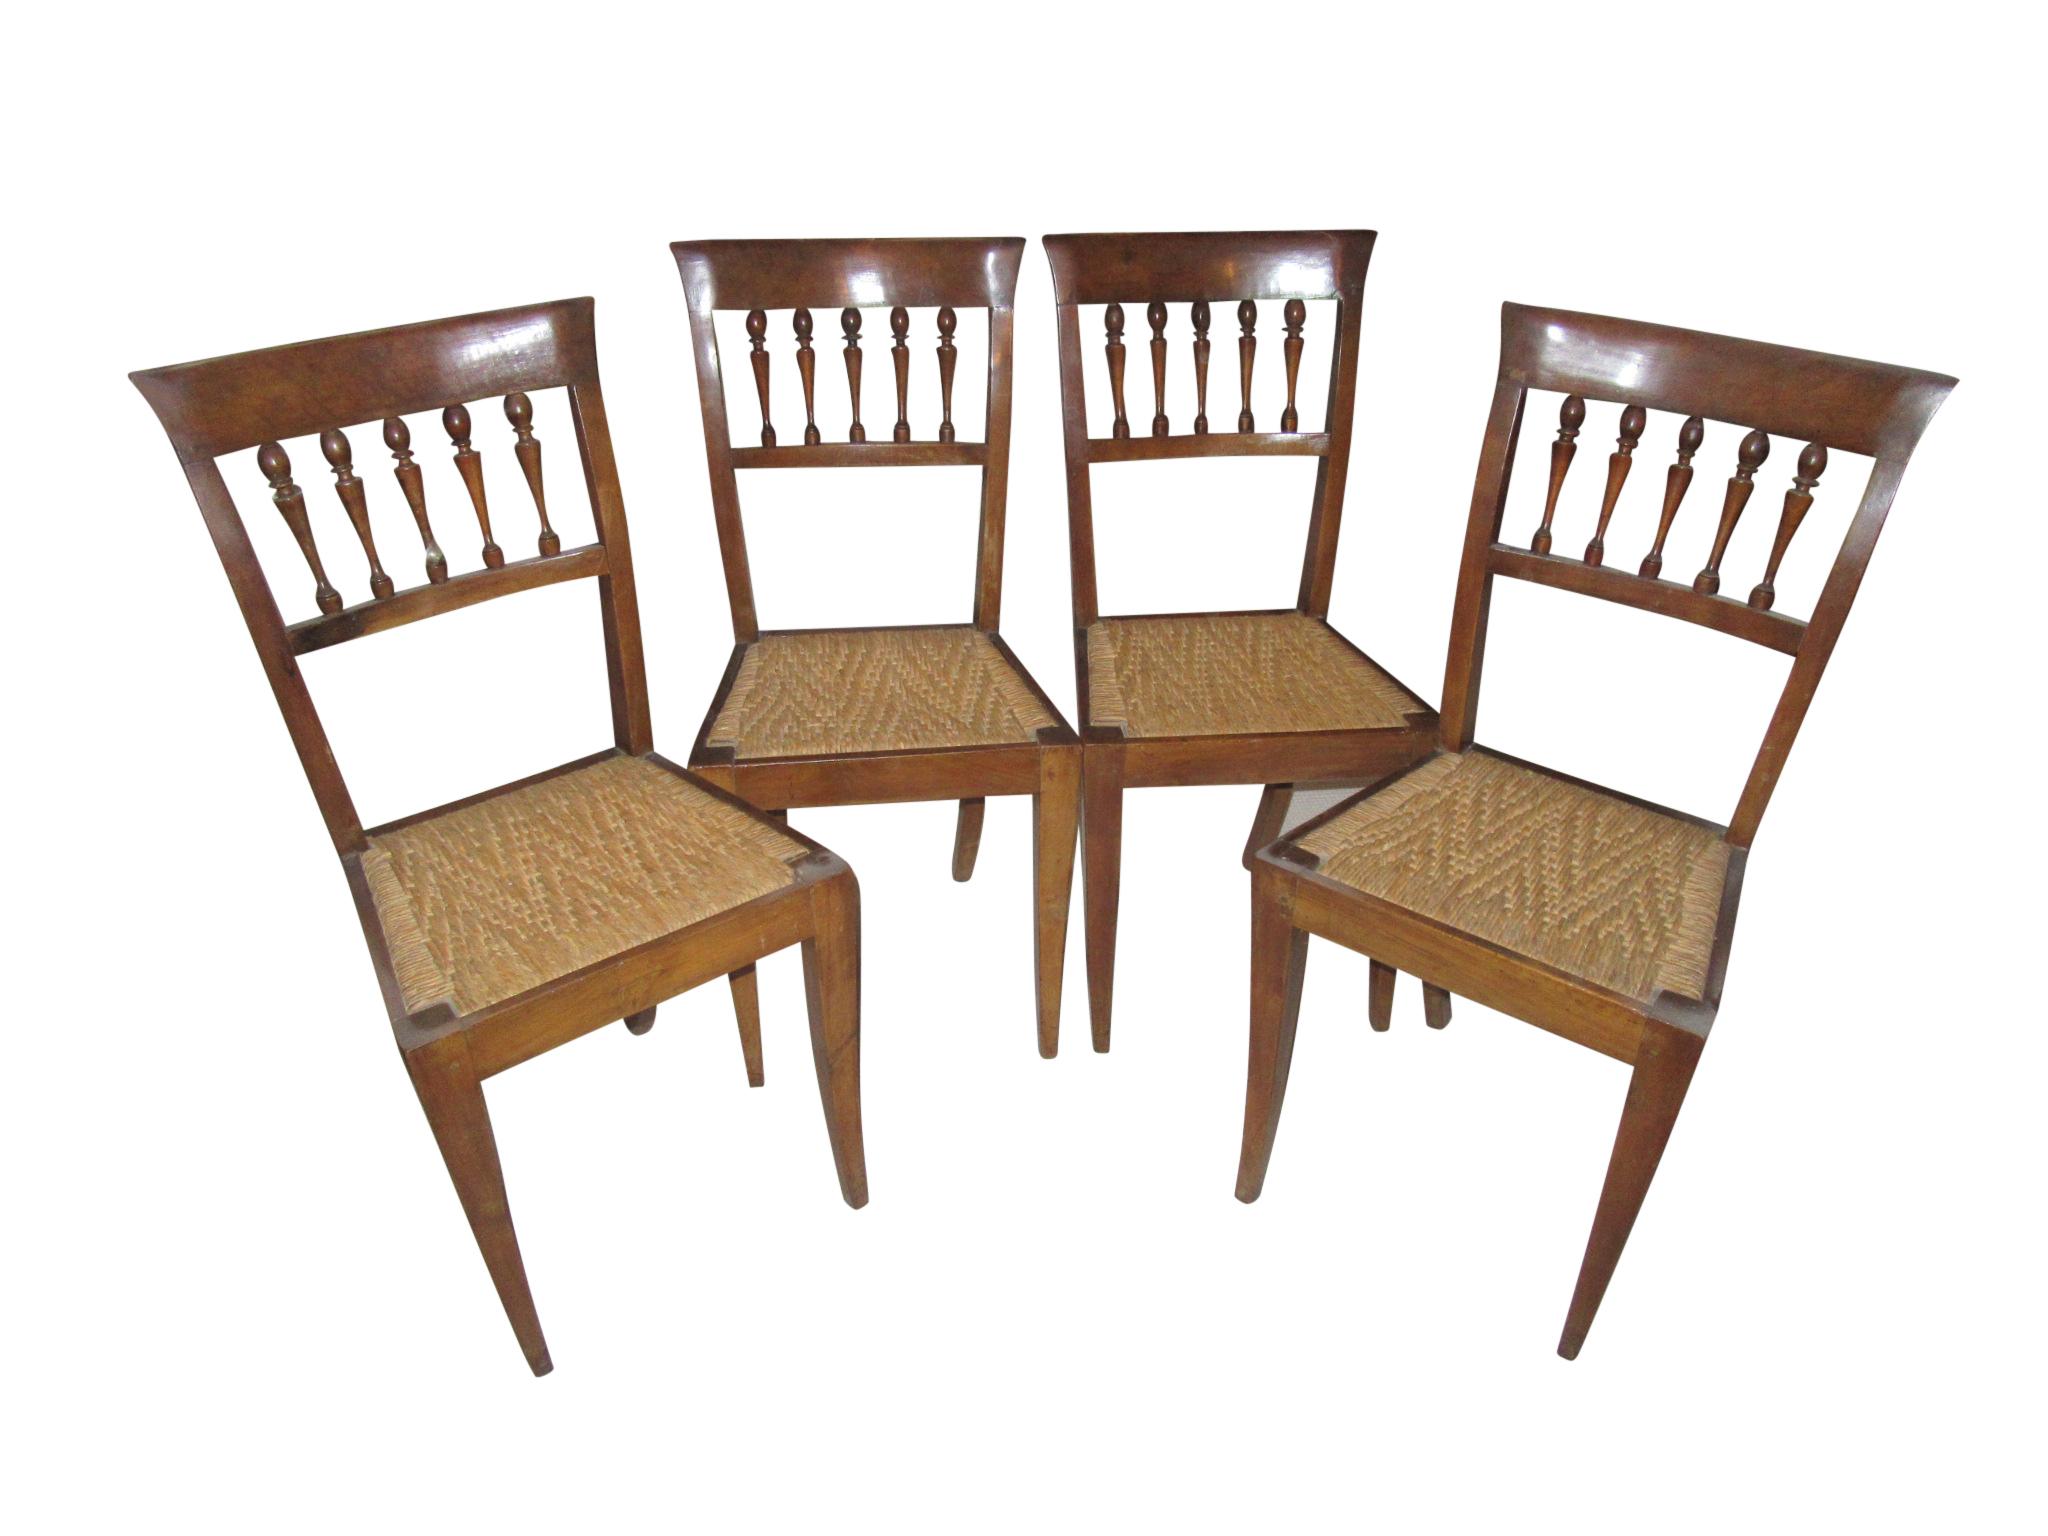 Sedie Antiche Luigi Xvi.Sedie Arredamento Mobili Antiquariato Musetti